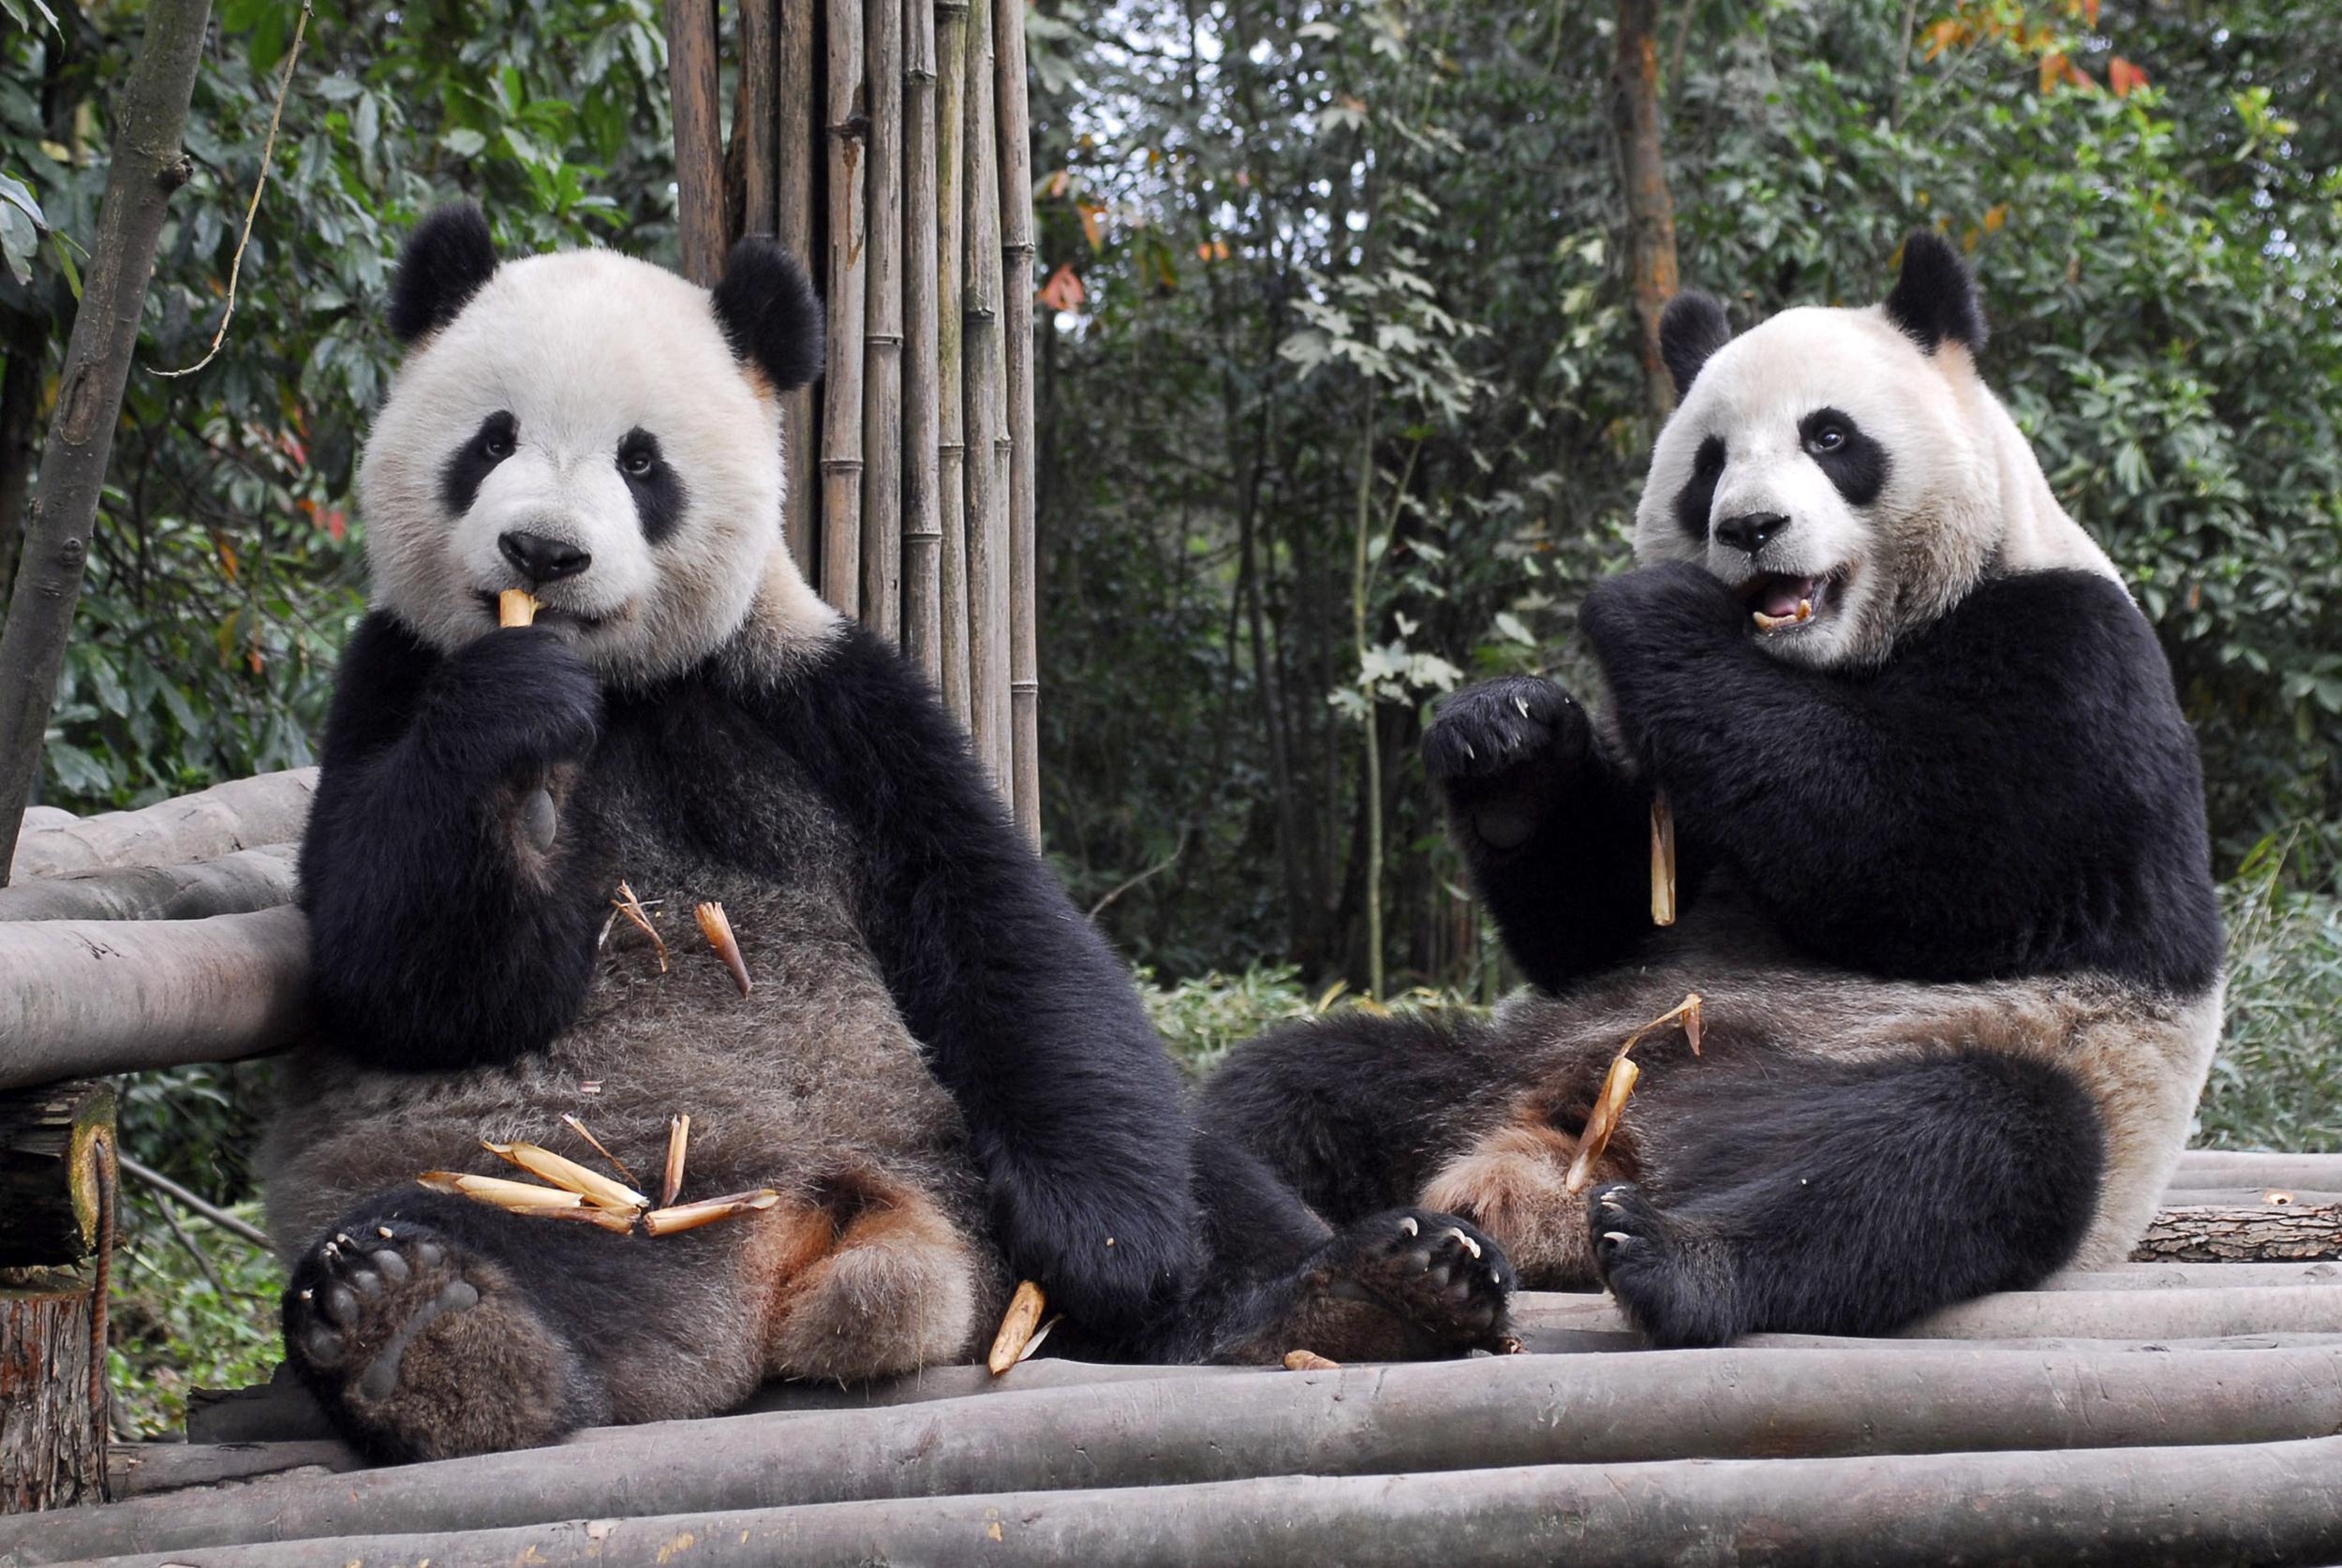 Image: Two giant pandas named